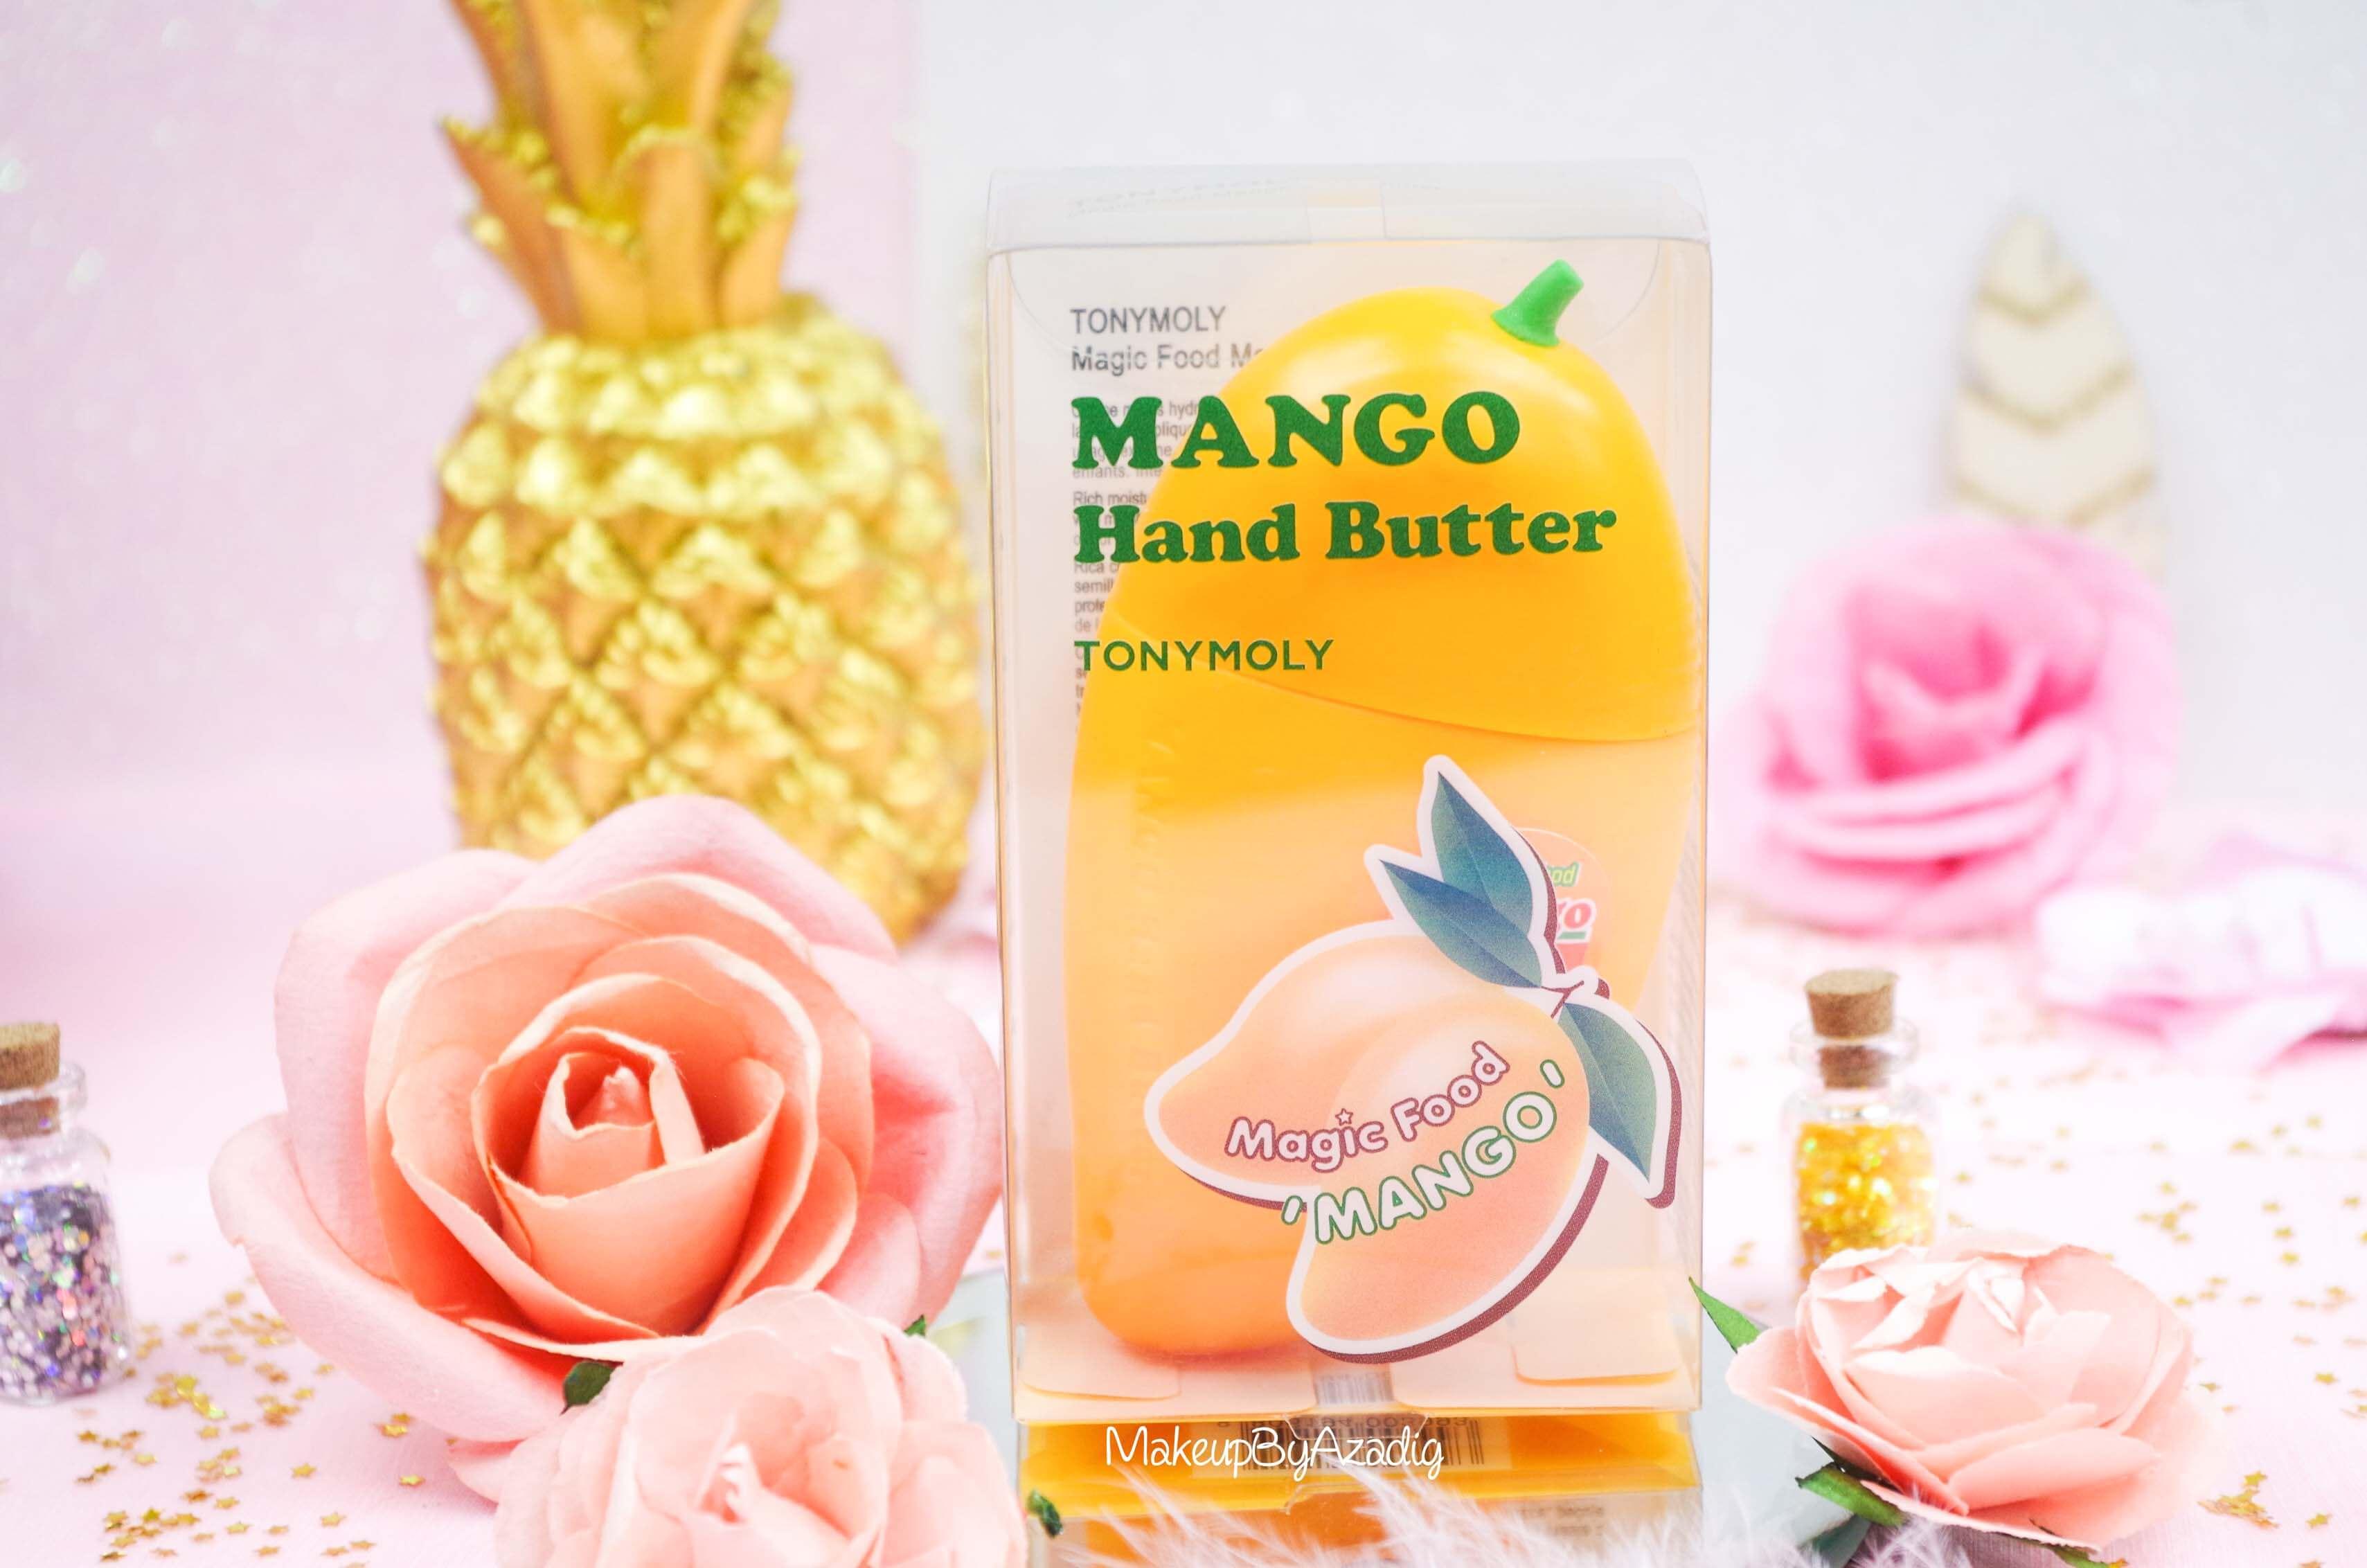 creme-mains-mango-hand-butter-tonymoly-sephora-france-cocooning-revue-avis-prix-makeupbyazadig-influencer-mangue